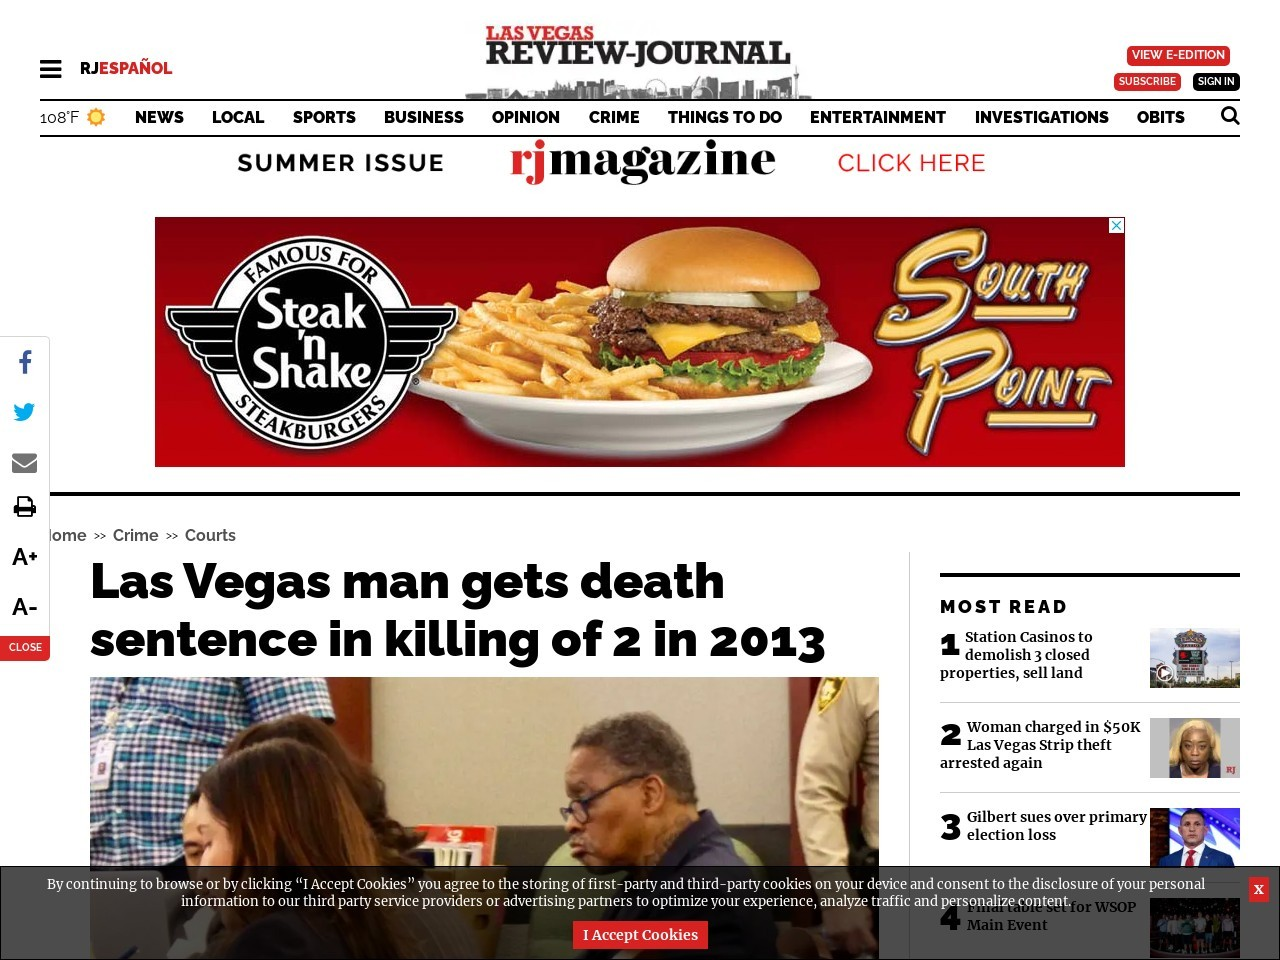 Las Vegas man gets death sentence in killing of 2 in 2013